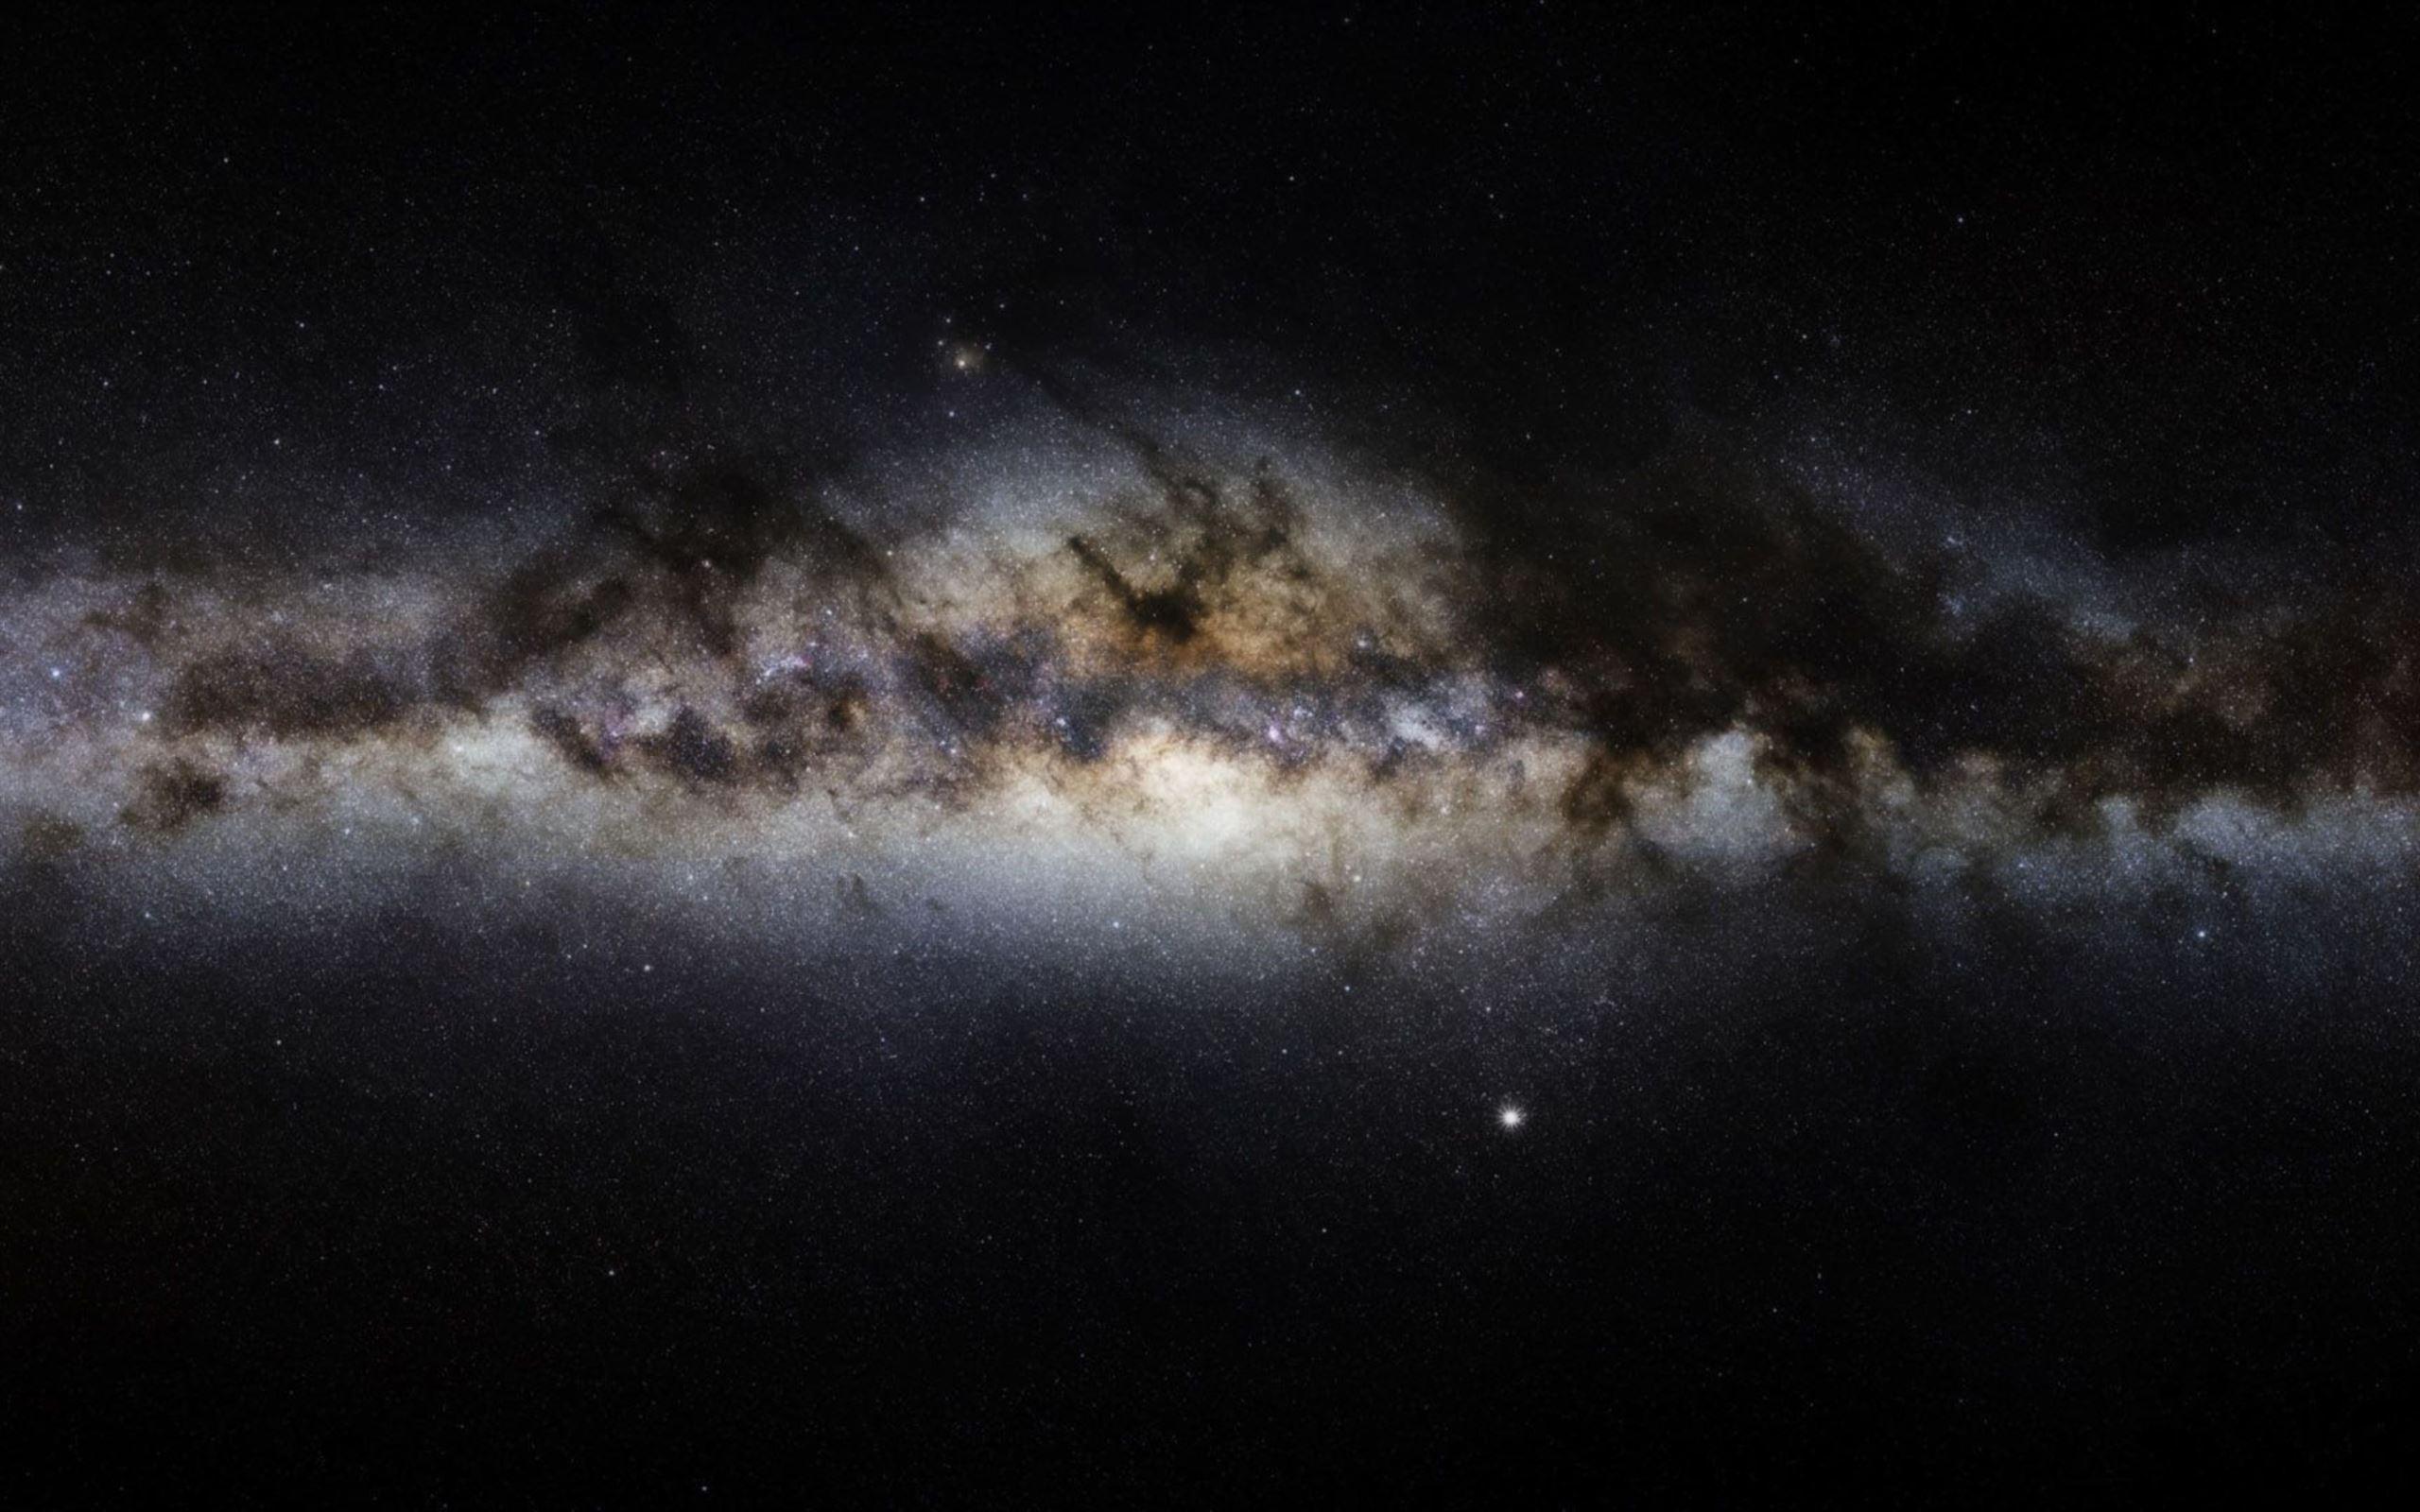 Milky Way Mac Wallpaper Download | Free Mac Wallpapers ...